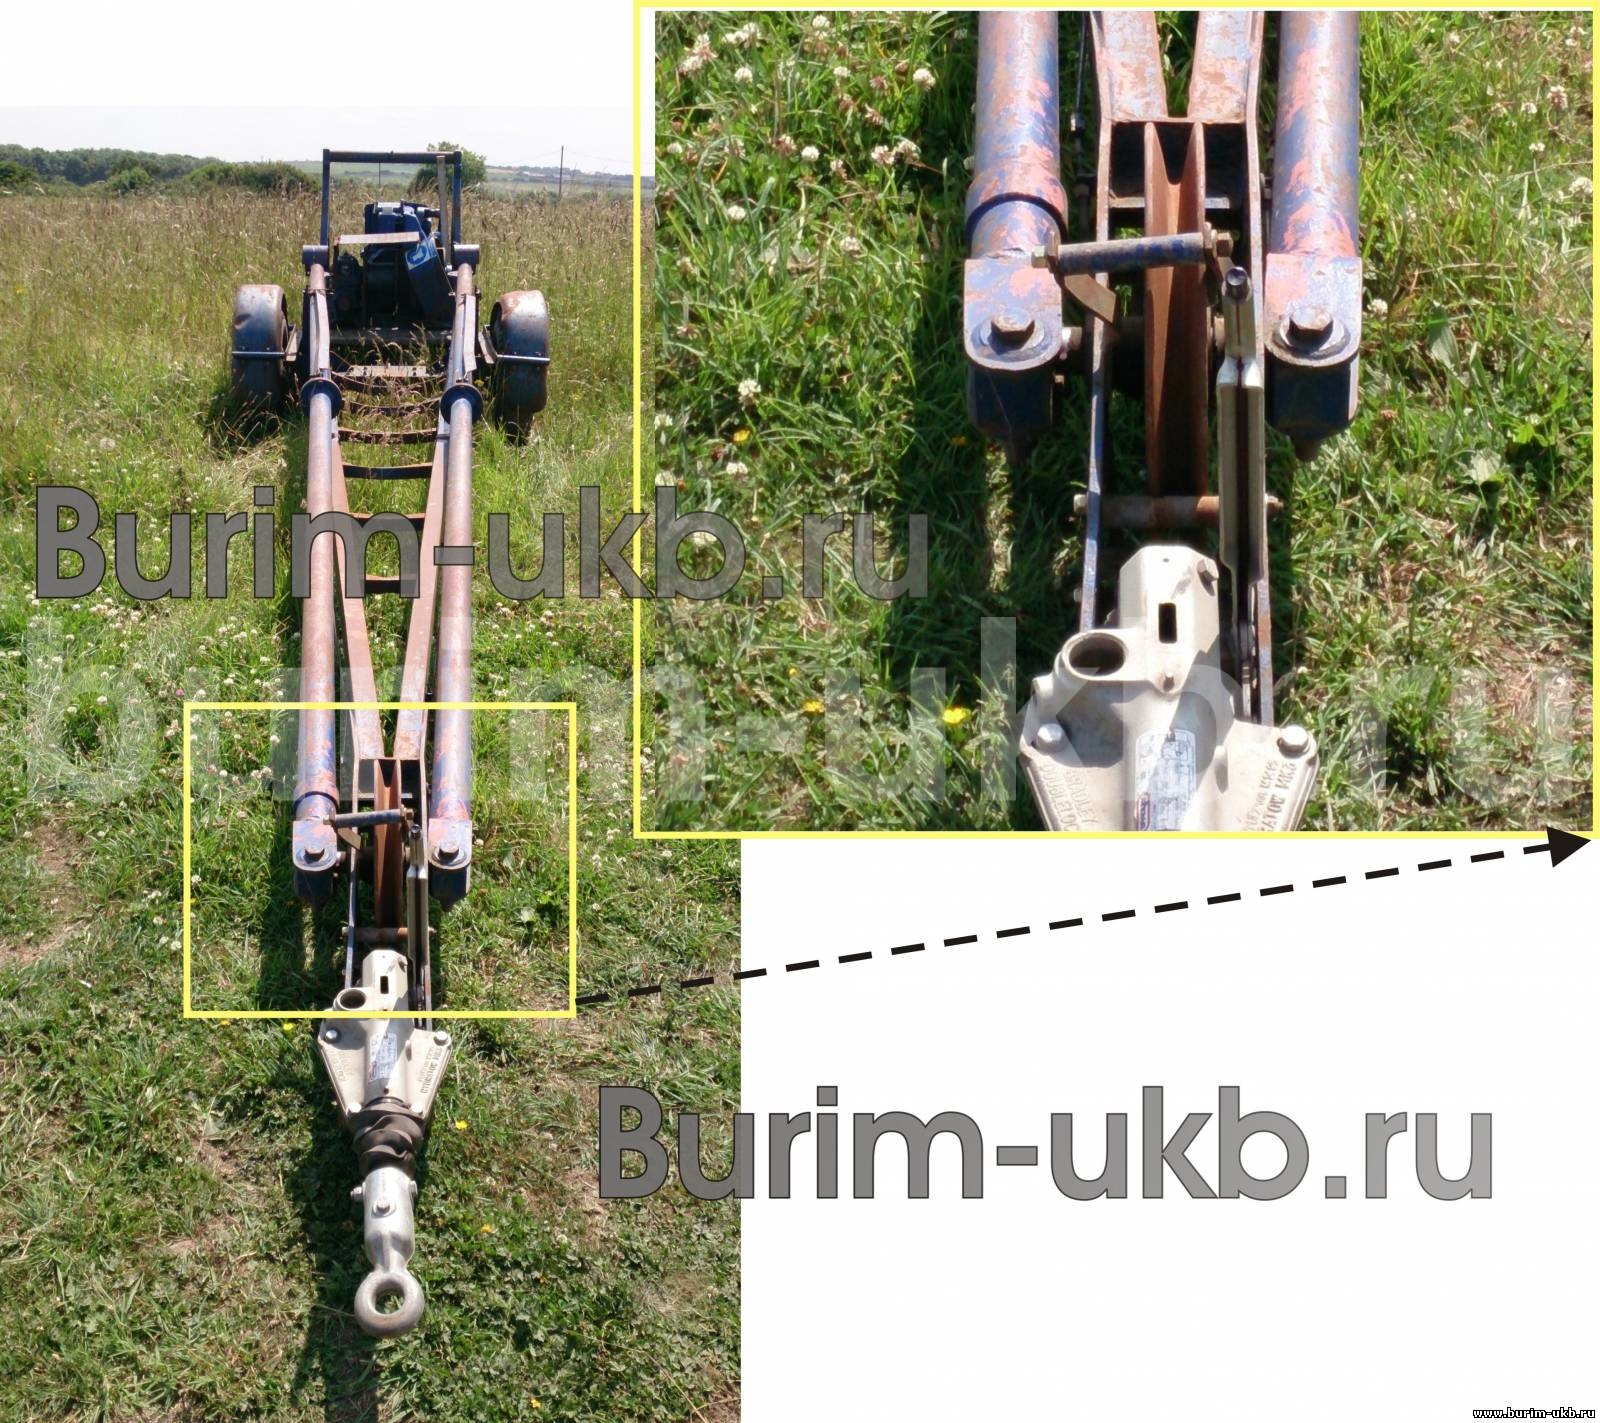 Burovaya-ustanovka_BURIM-UKB.RU 055